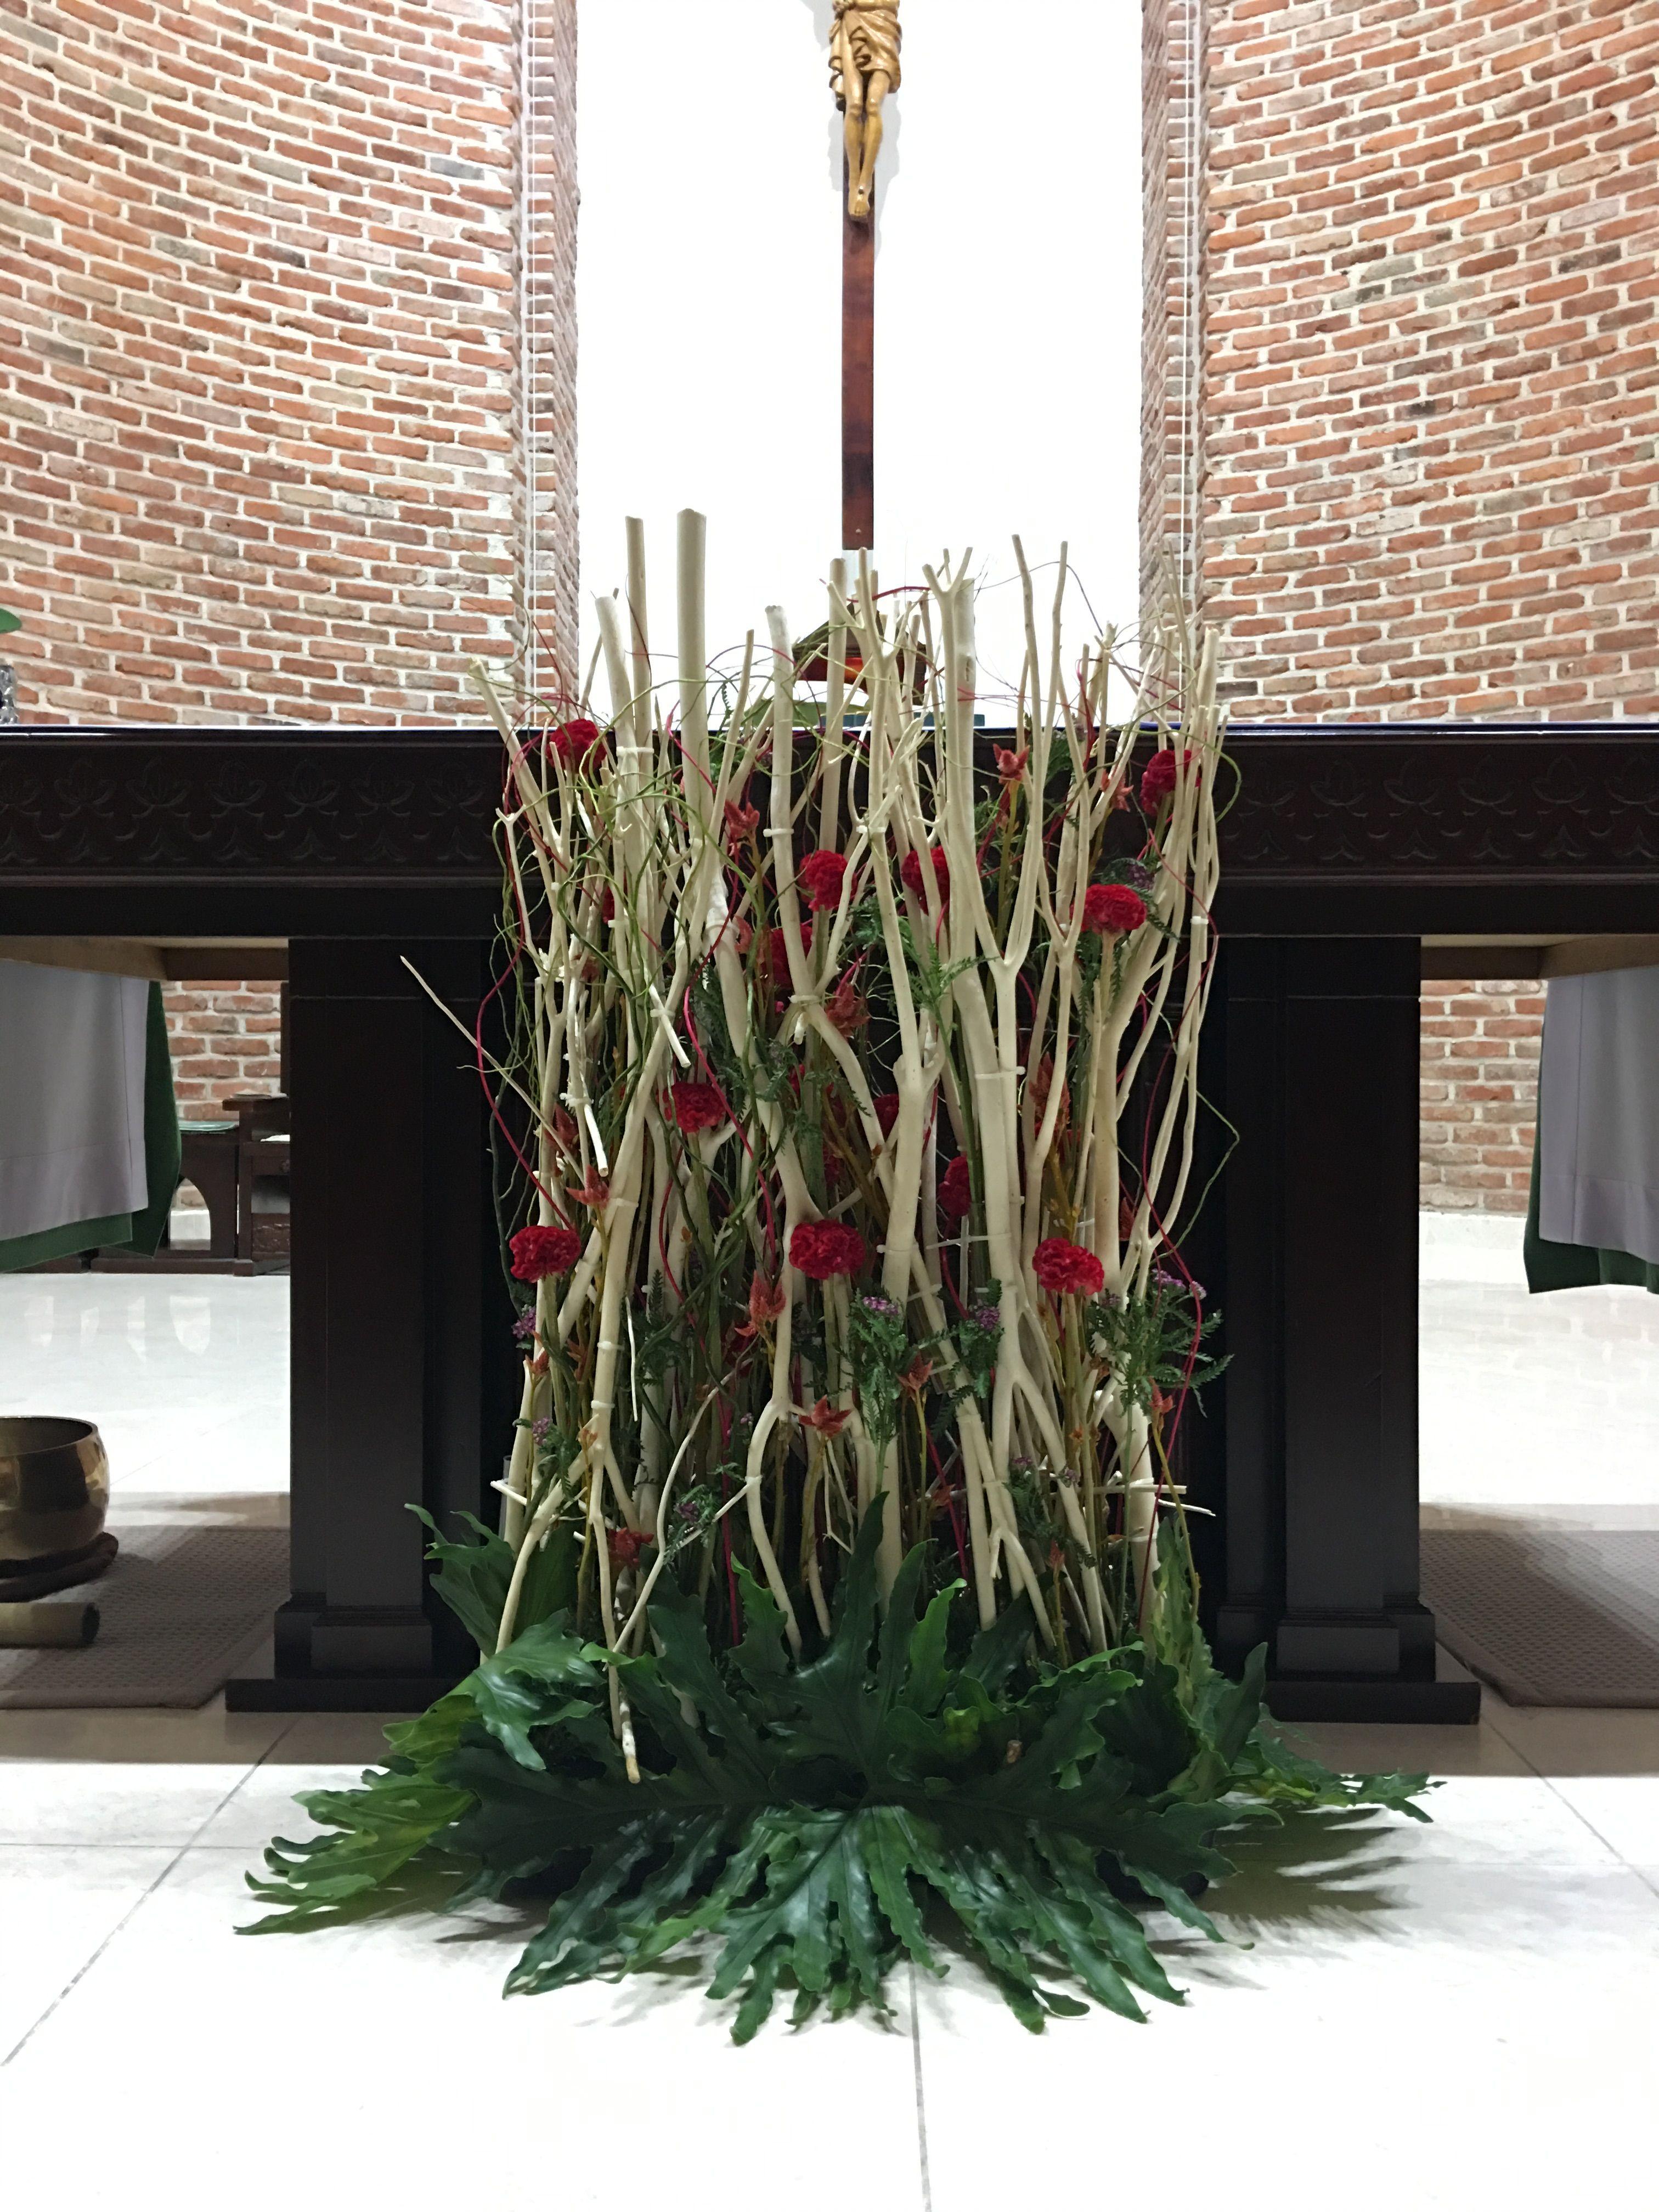 Pin by Mariana de on Arreglos florales | Pinterest | Churches ...